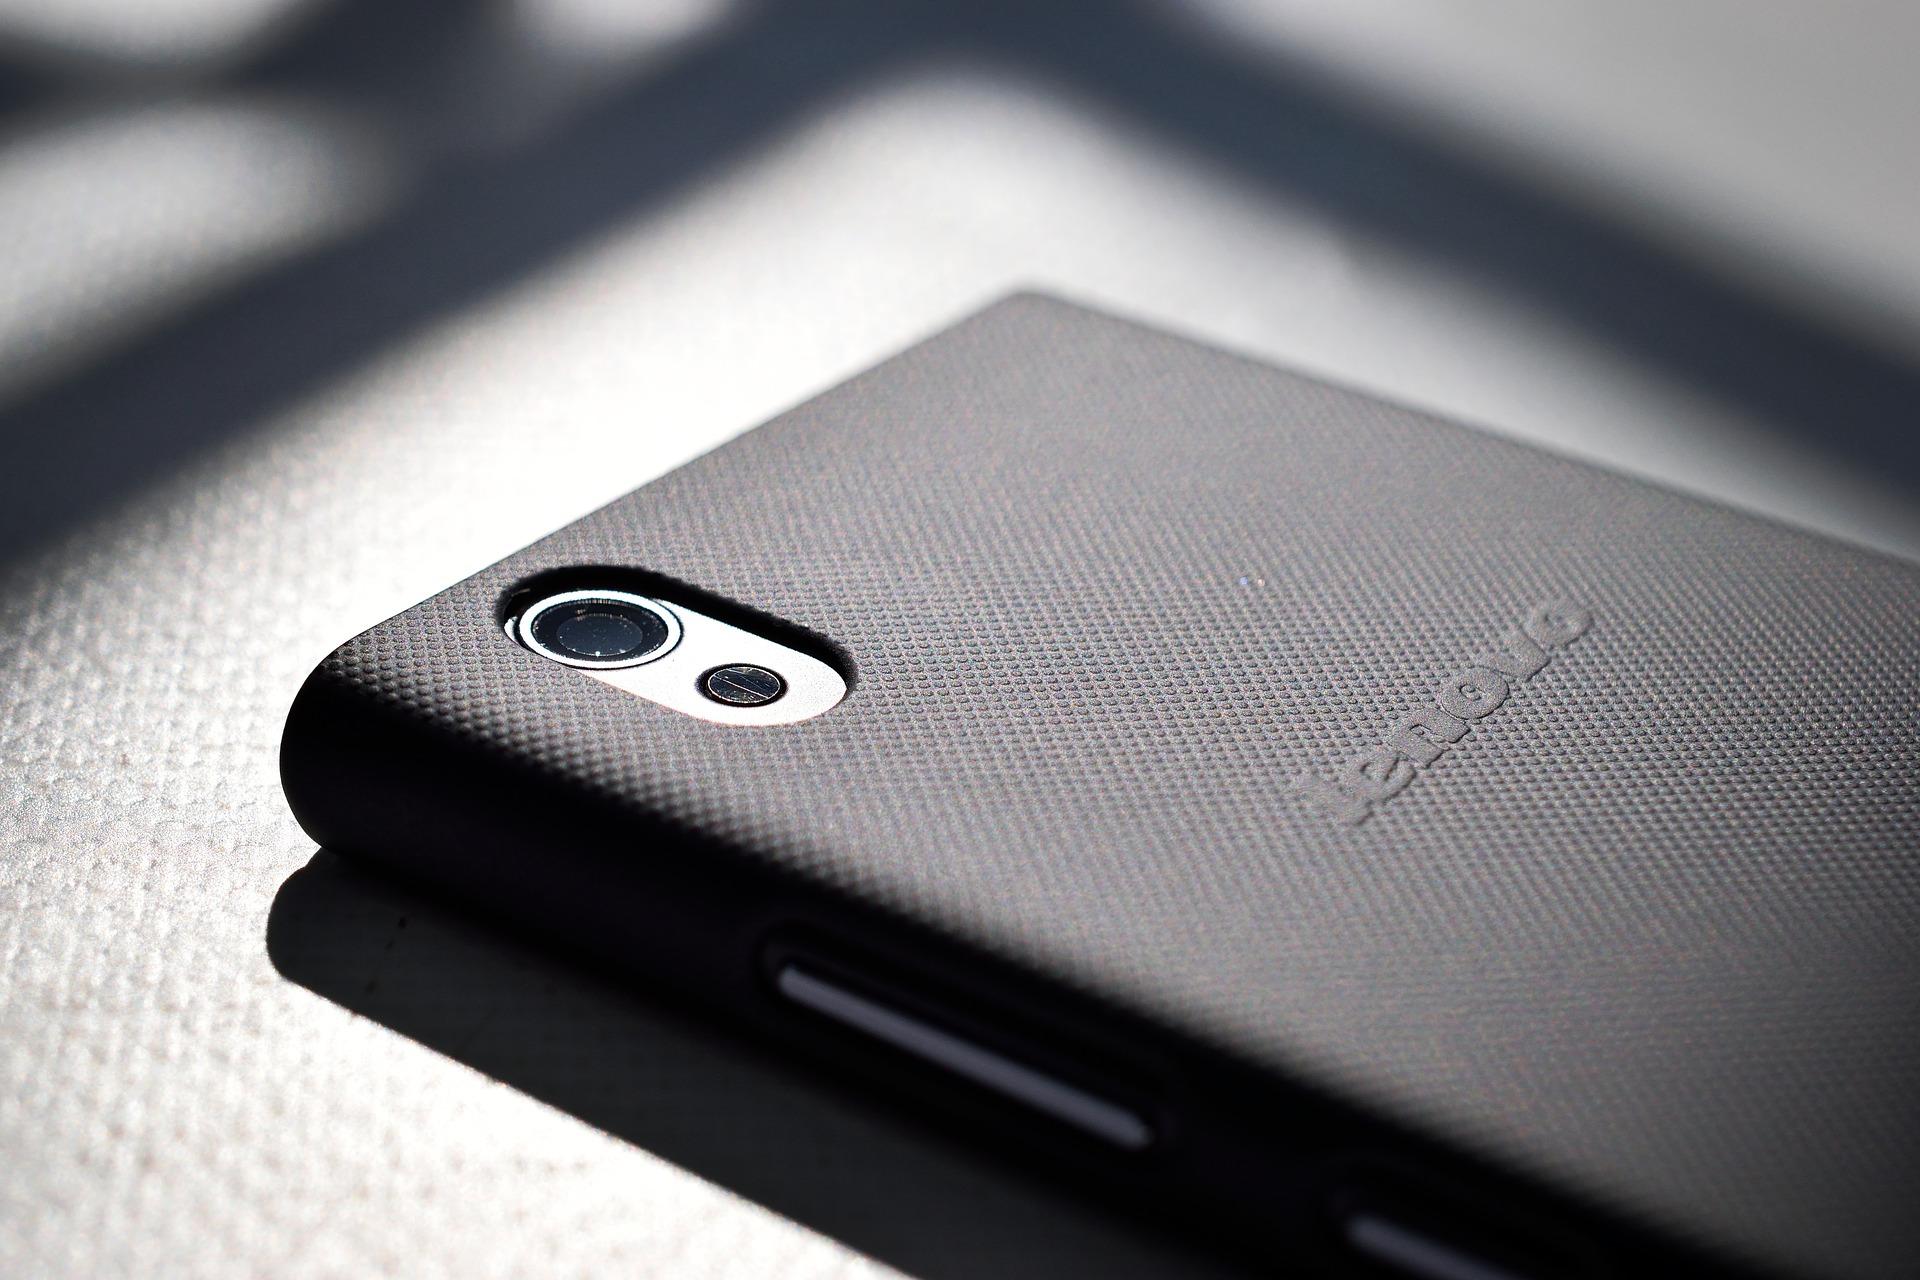 A Lenovo smartphone.